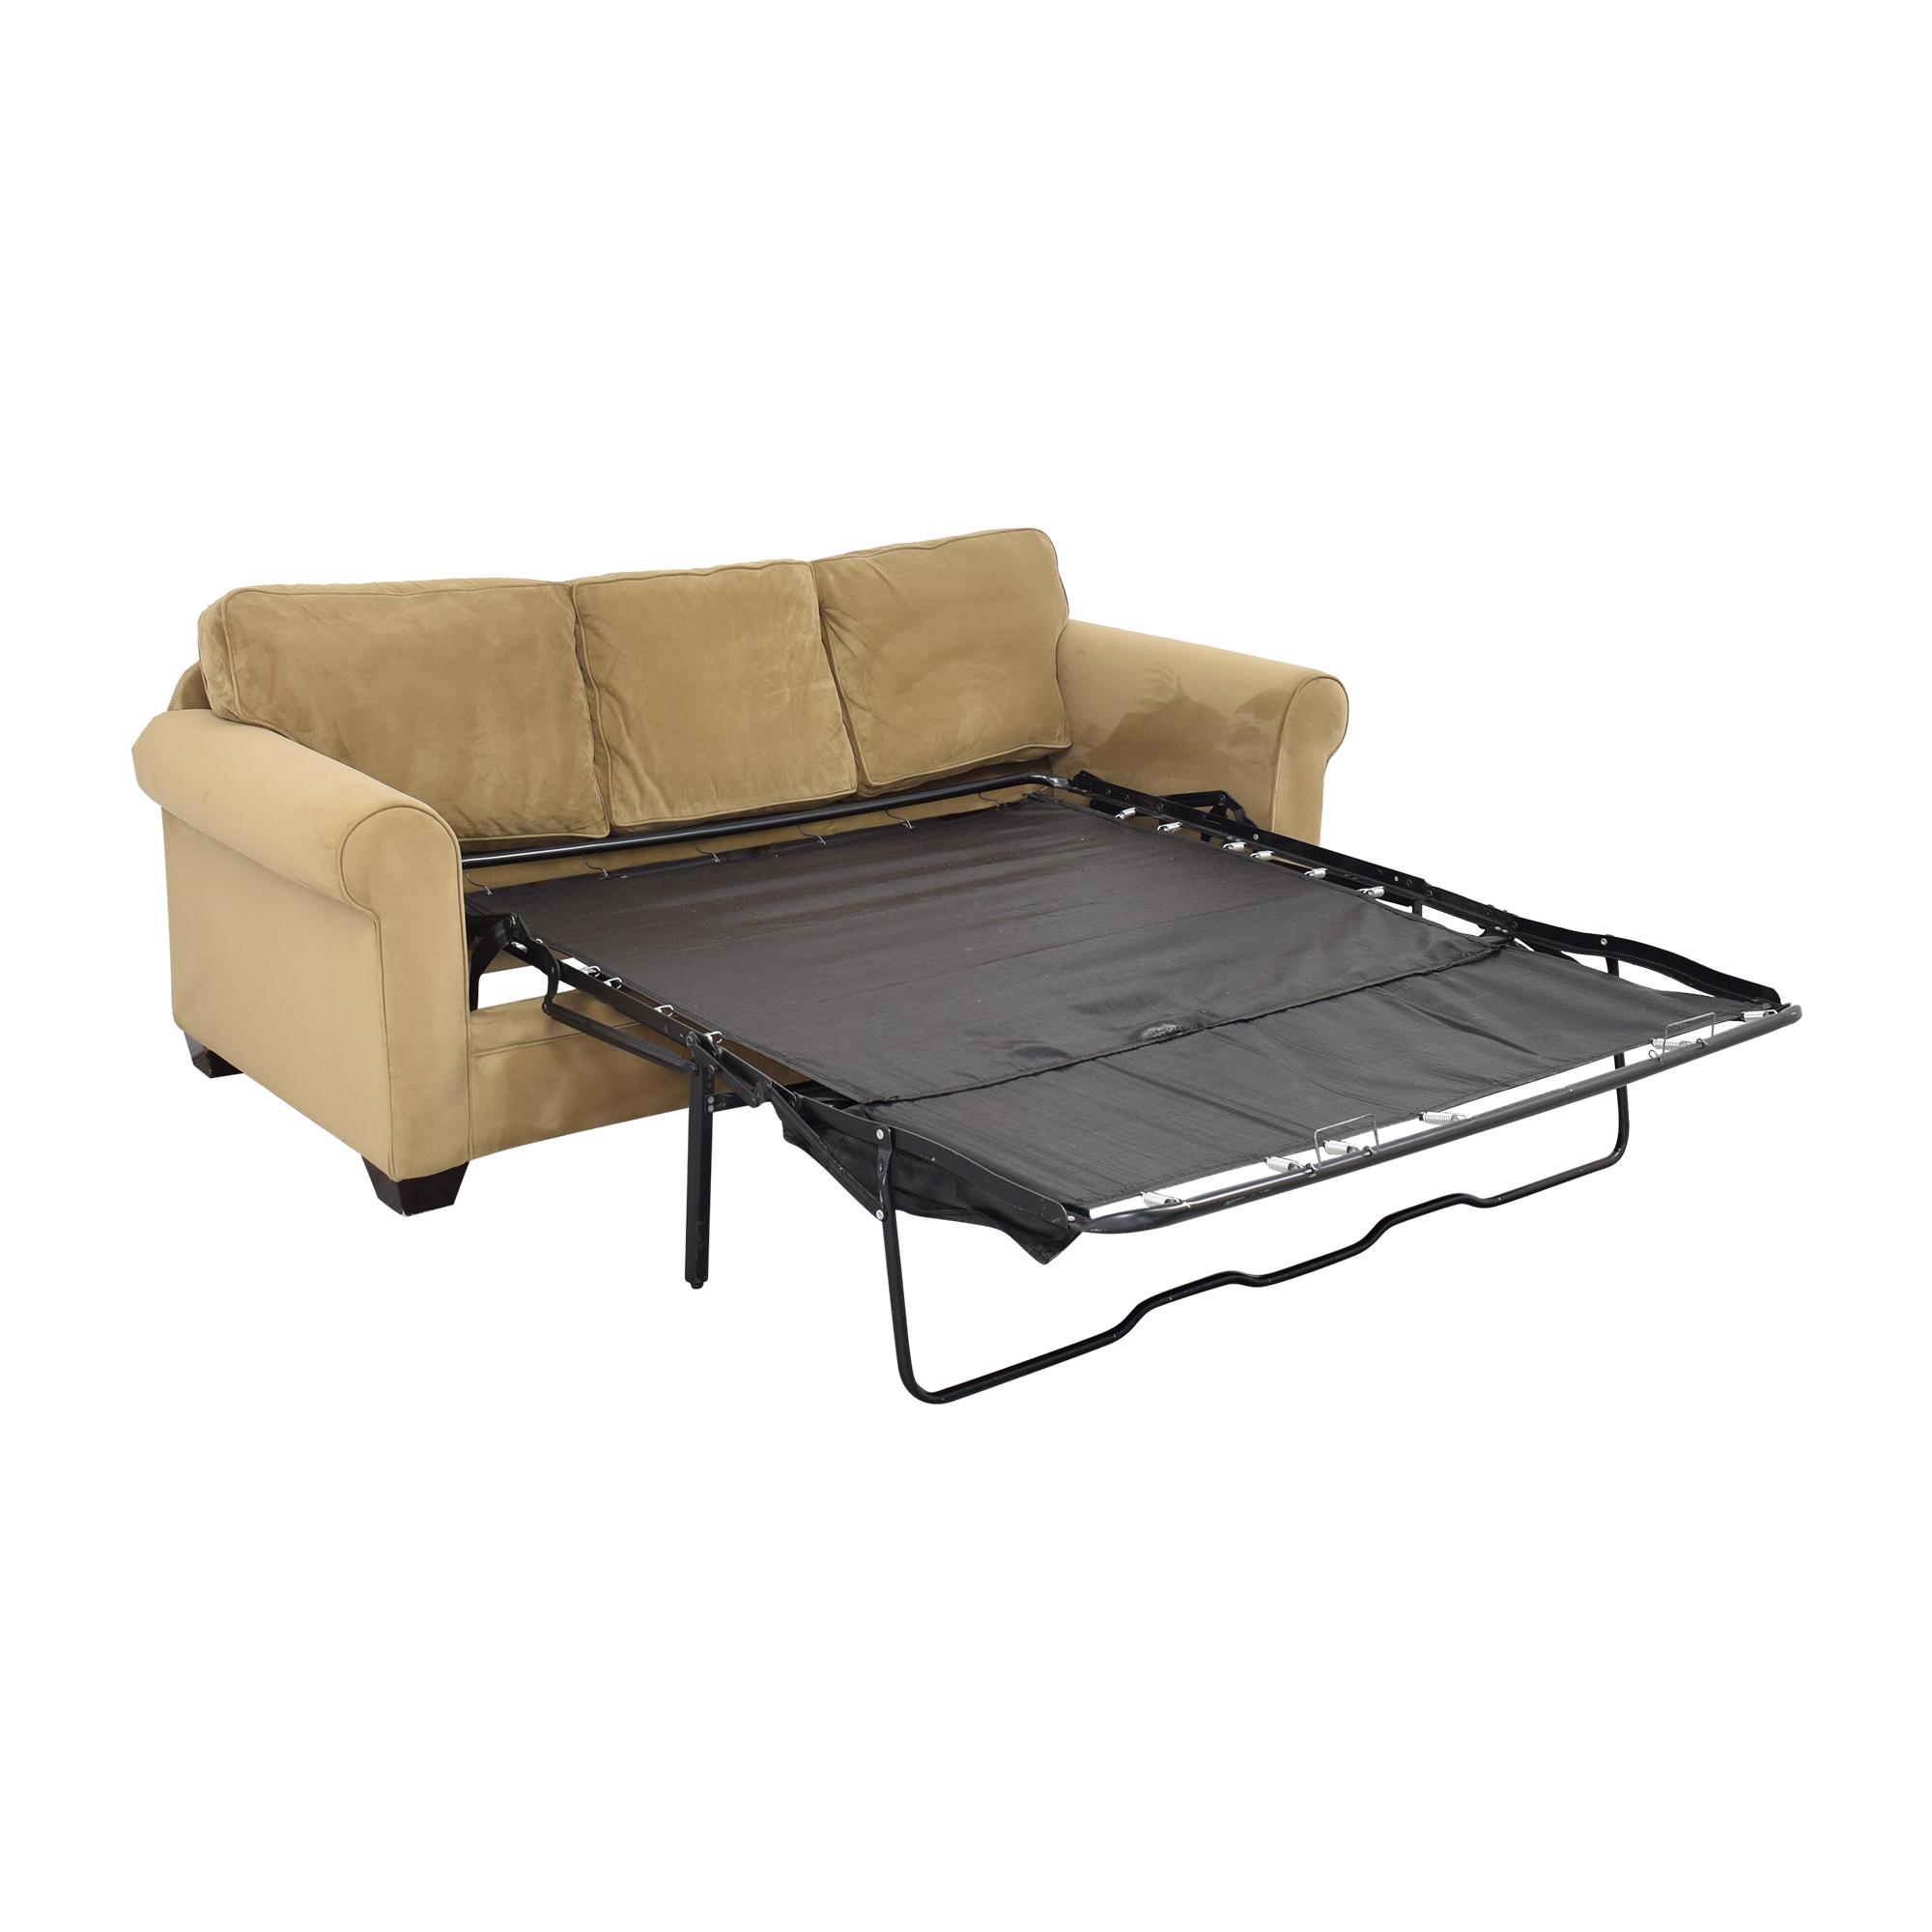 Macy's Macy's Tan Sofa Bed on sale